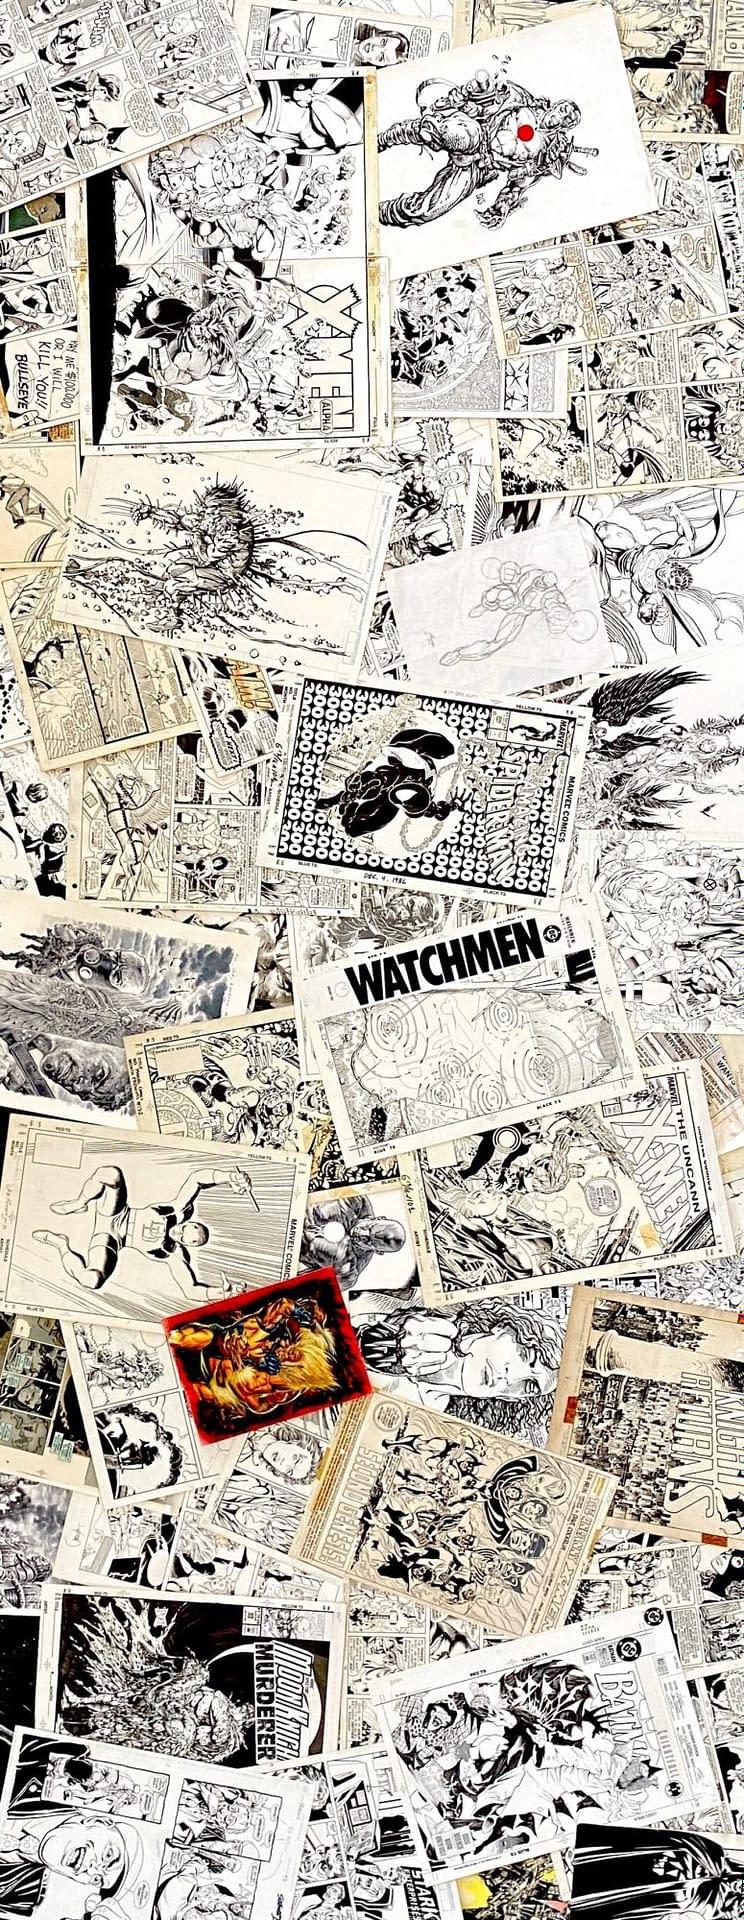 Dinesh Shamdasani's Original Comics Artwork Collection - On The Floor